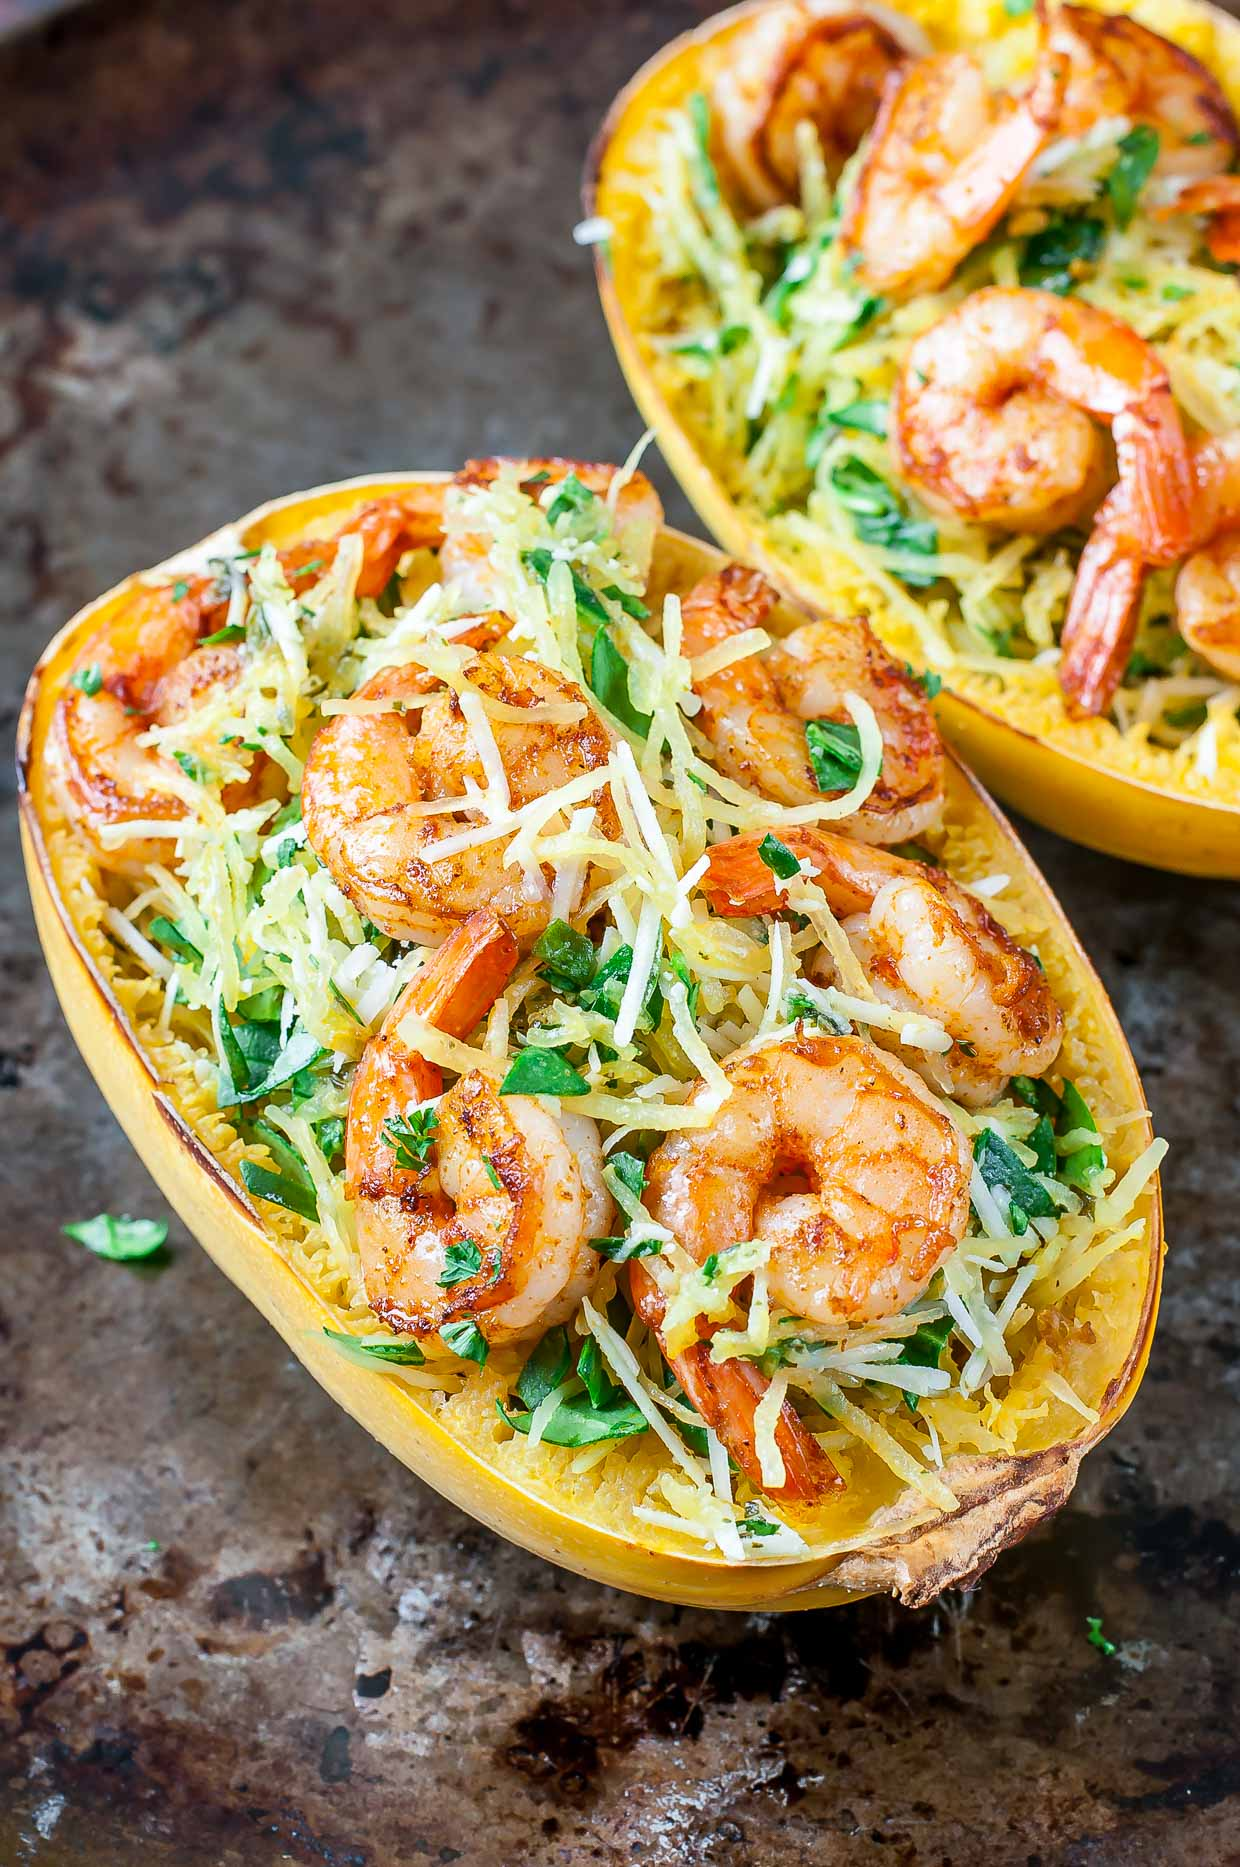 squash spaghetti pesto shrimp parmesan recipe diets swaps special spinach serve peas peasandcrayons cheese